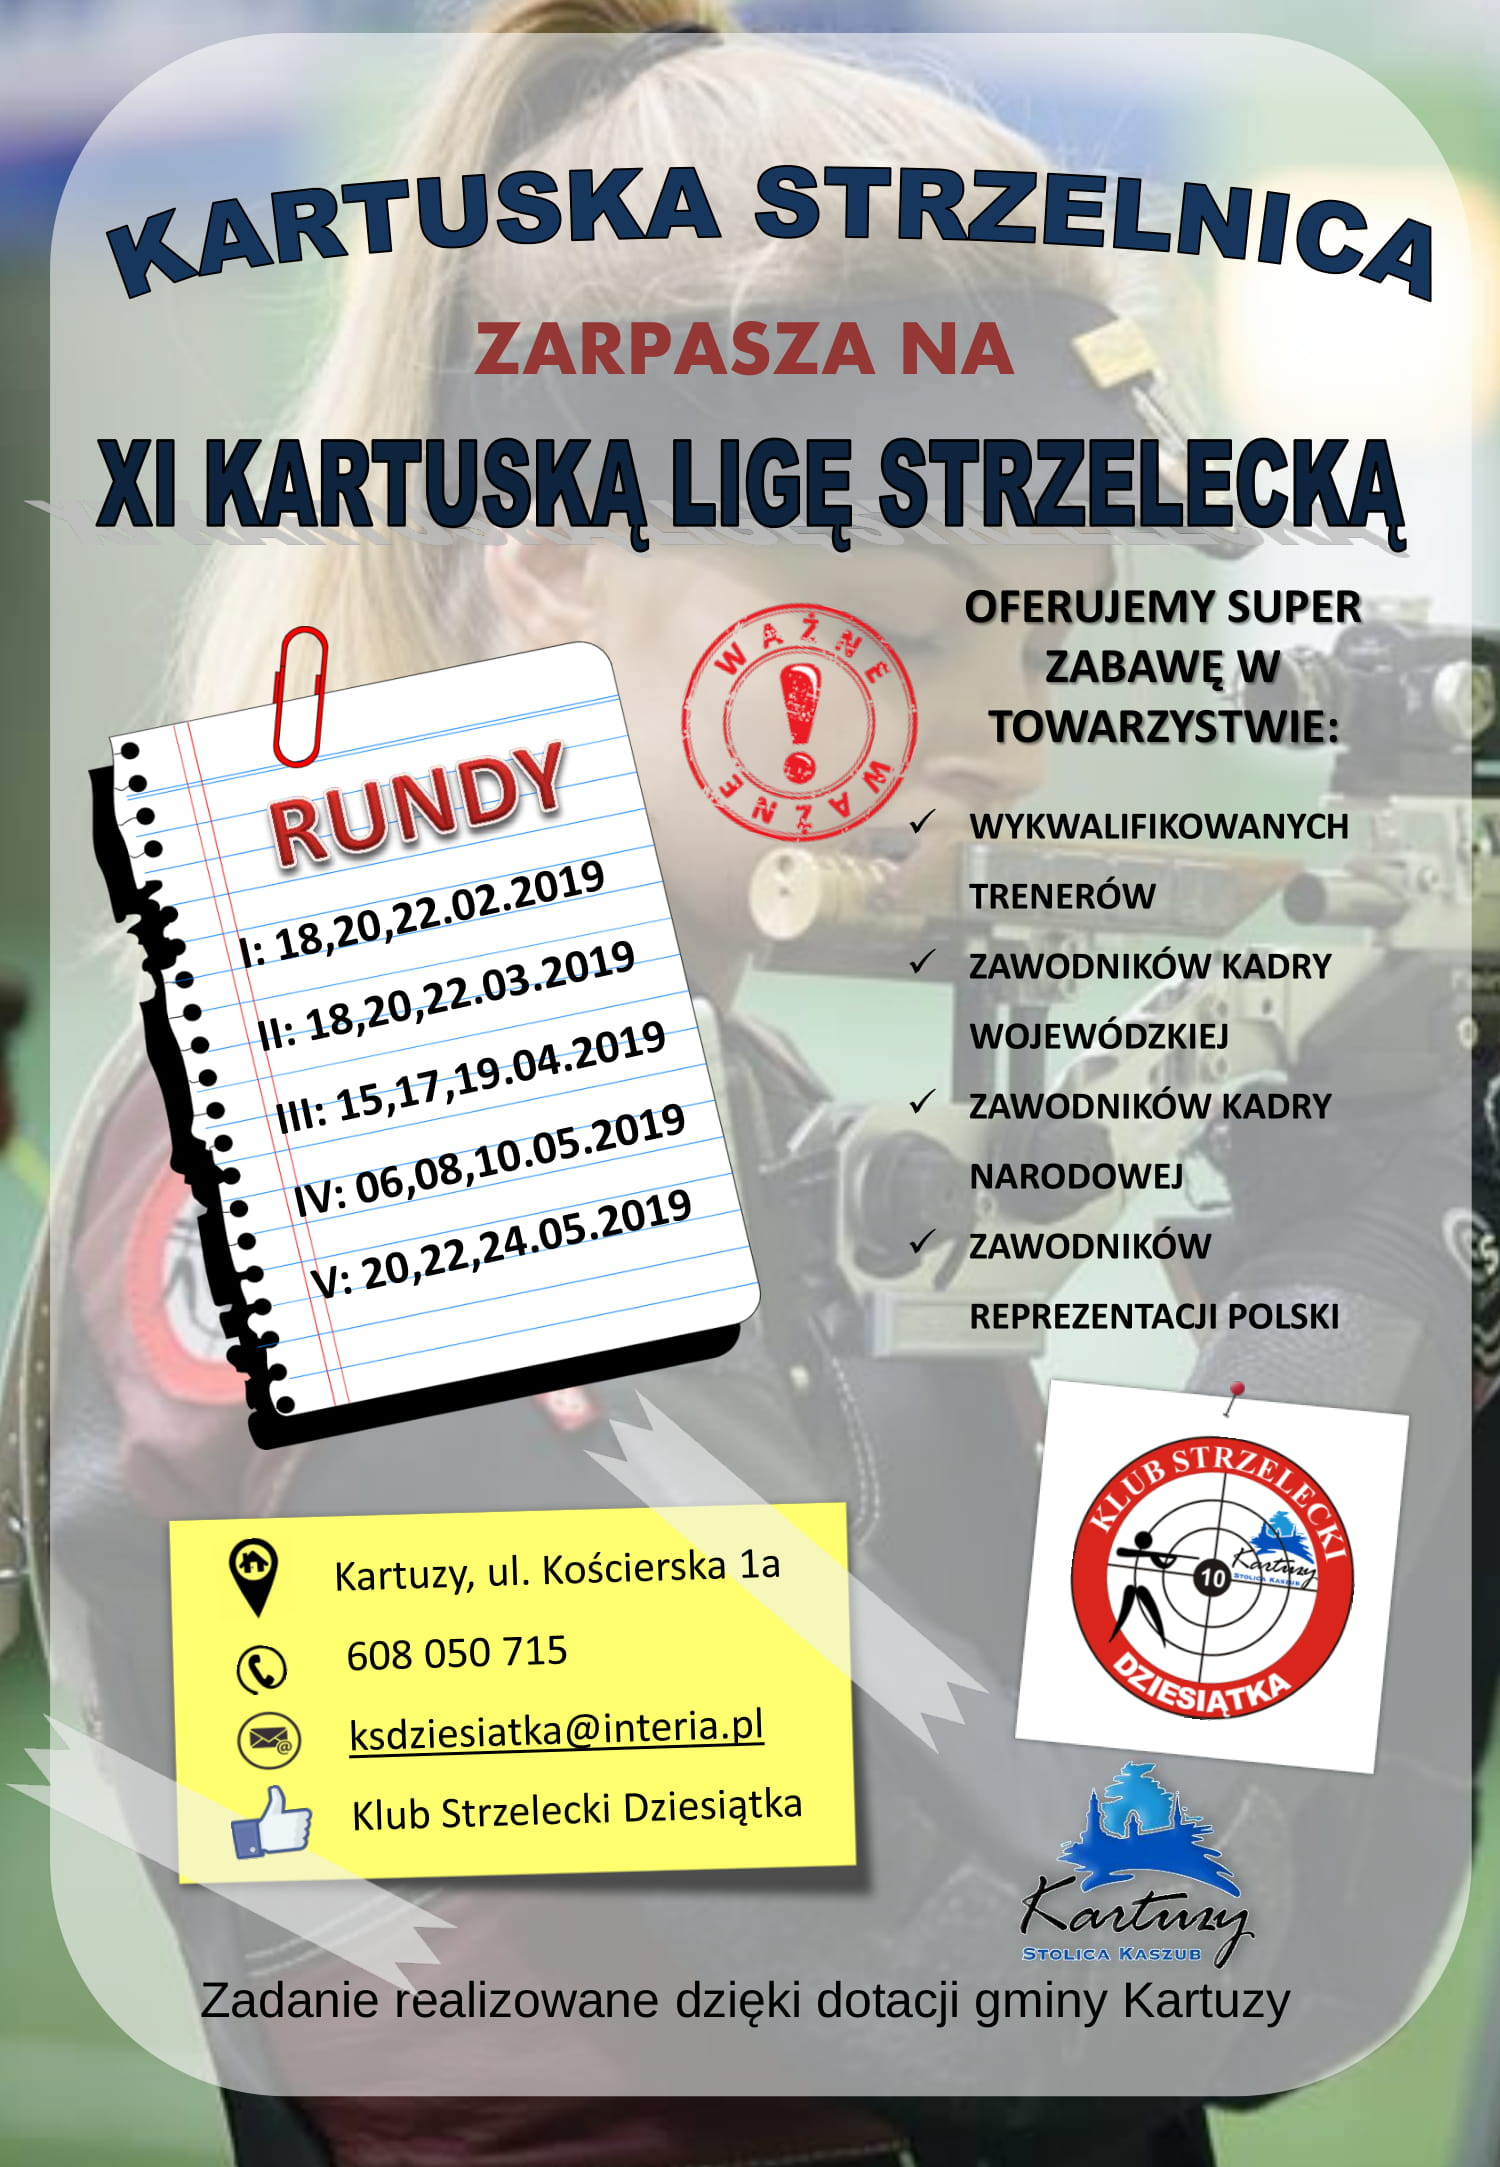 V runda XI Kartuskiej Ligi Strzeleckiej